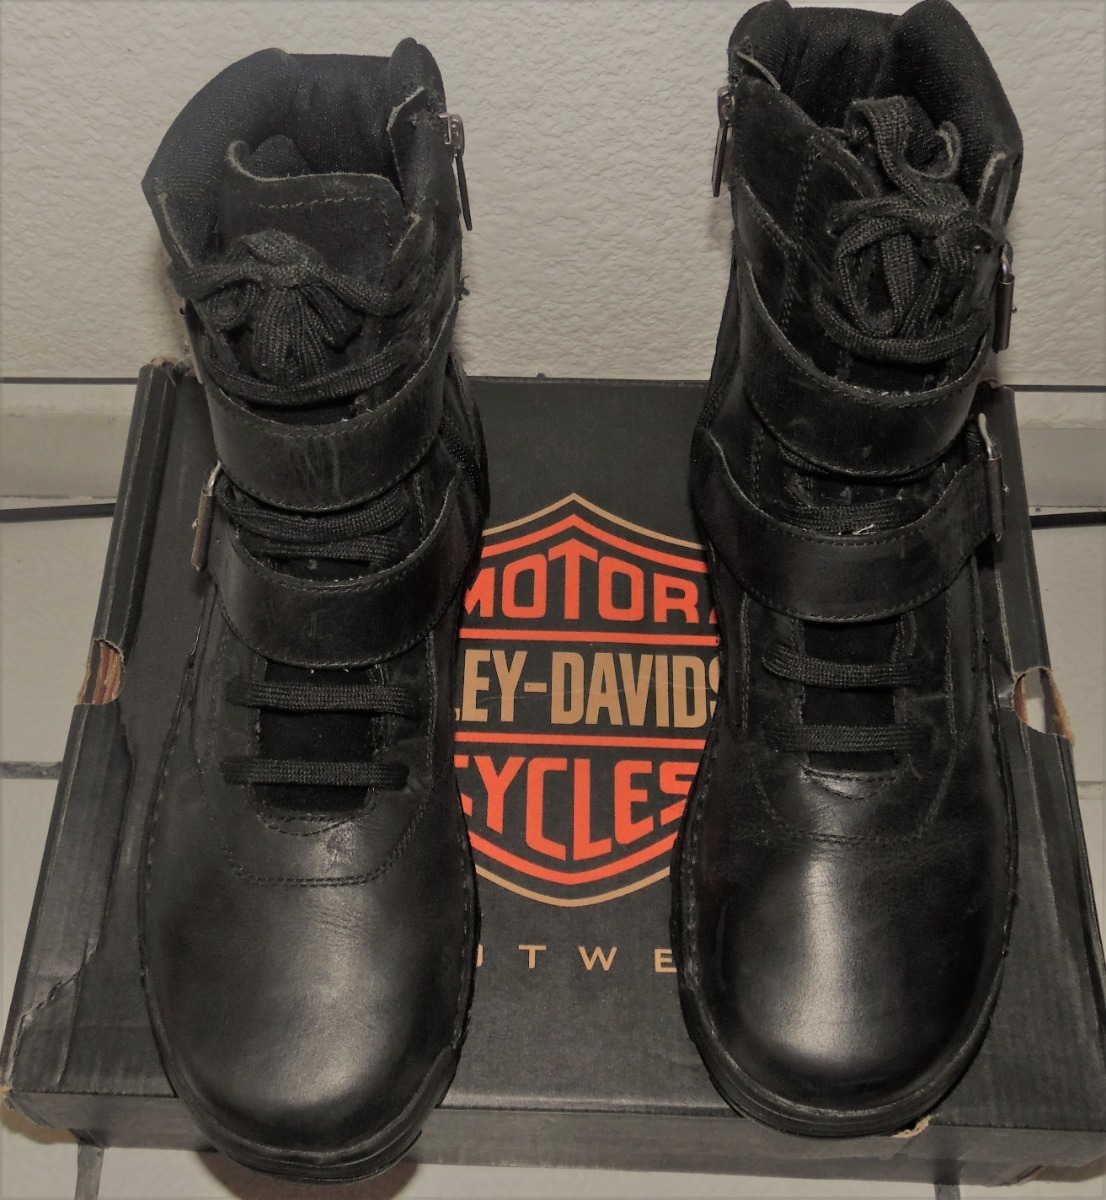 Harley-Davidson Hombres Botas Talla